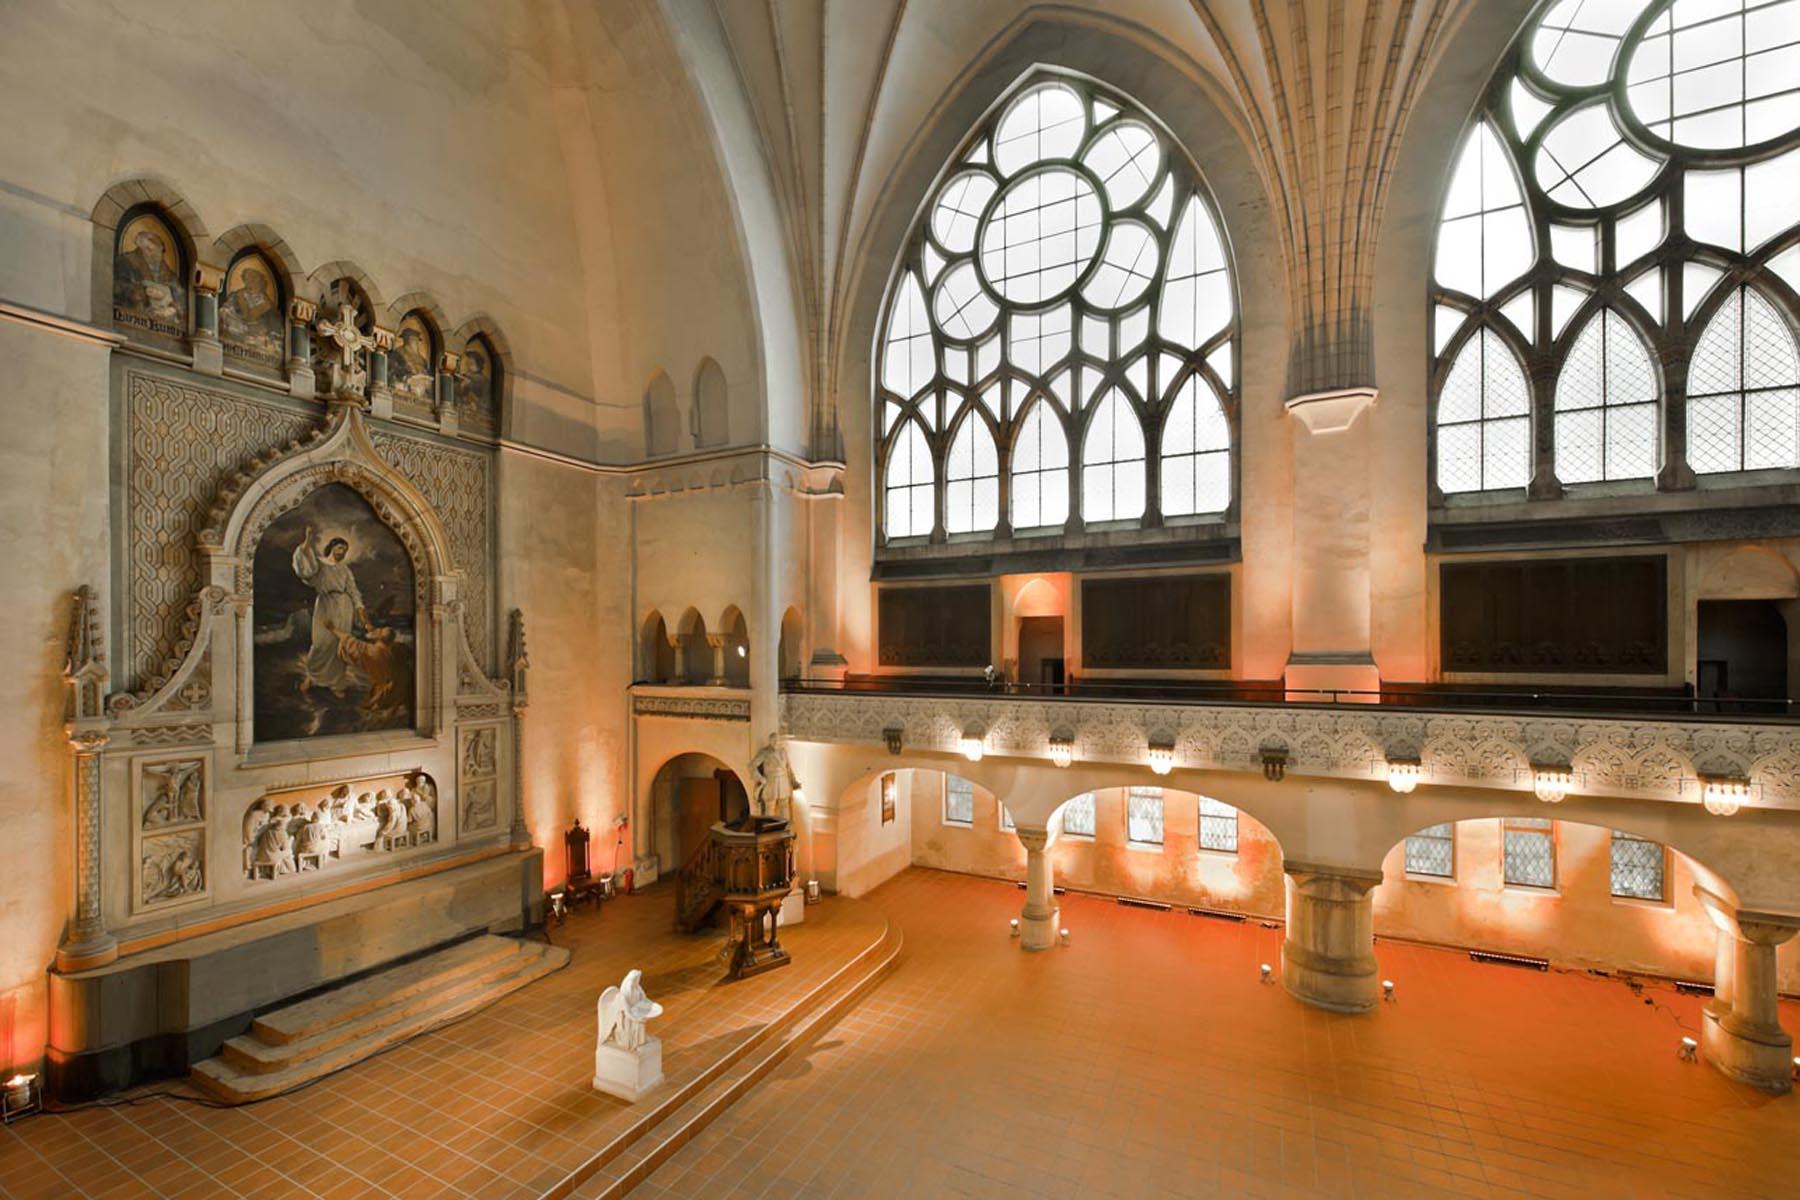 Zwingli-Kirche, Berlin